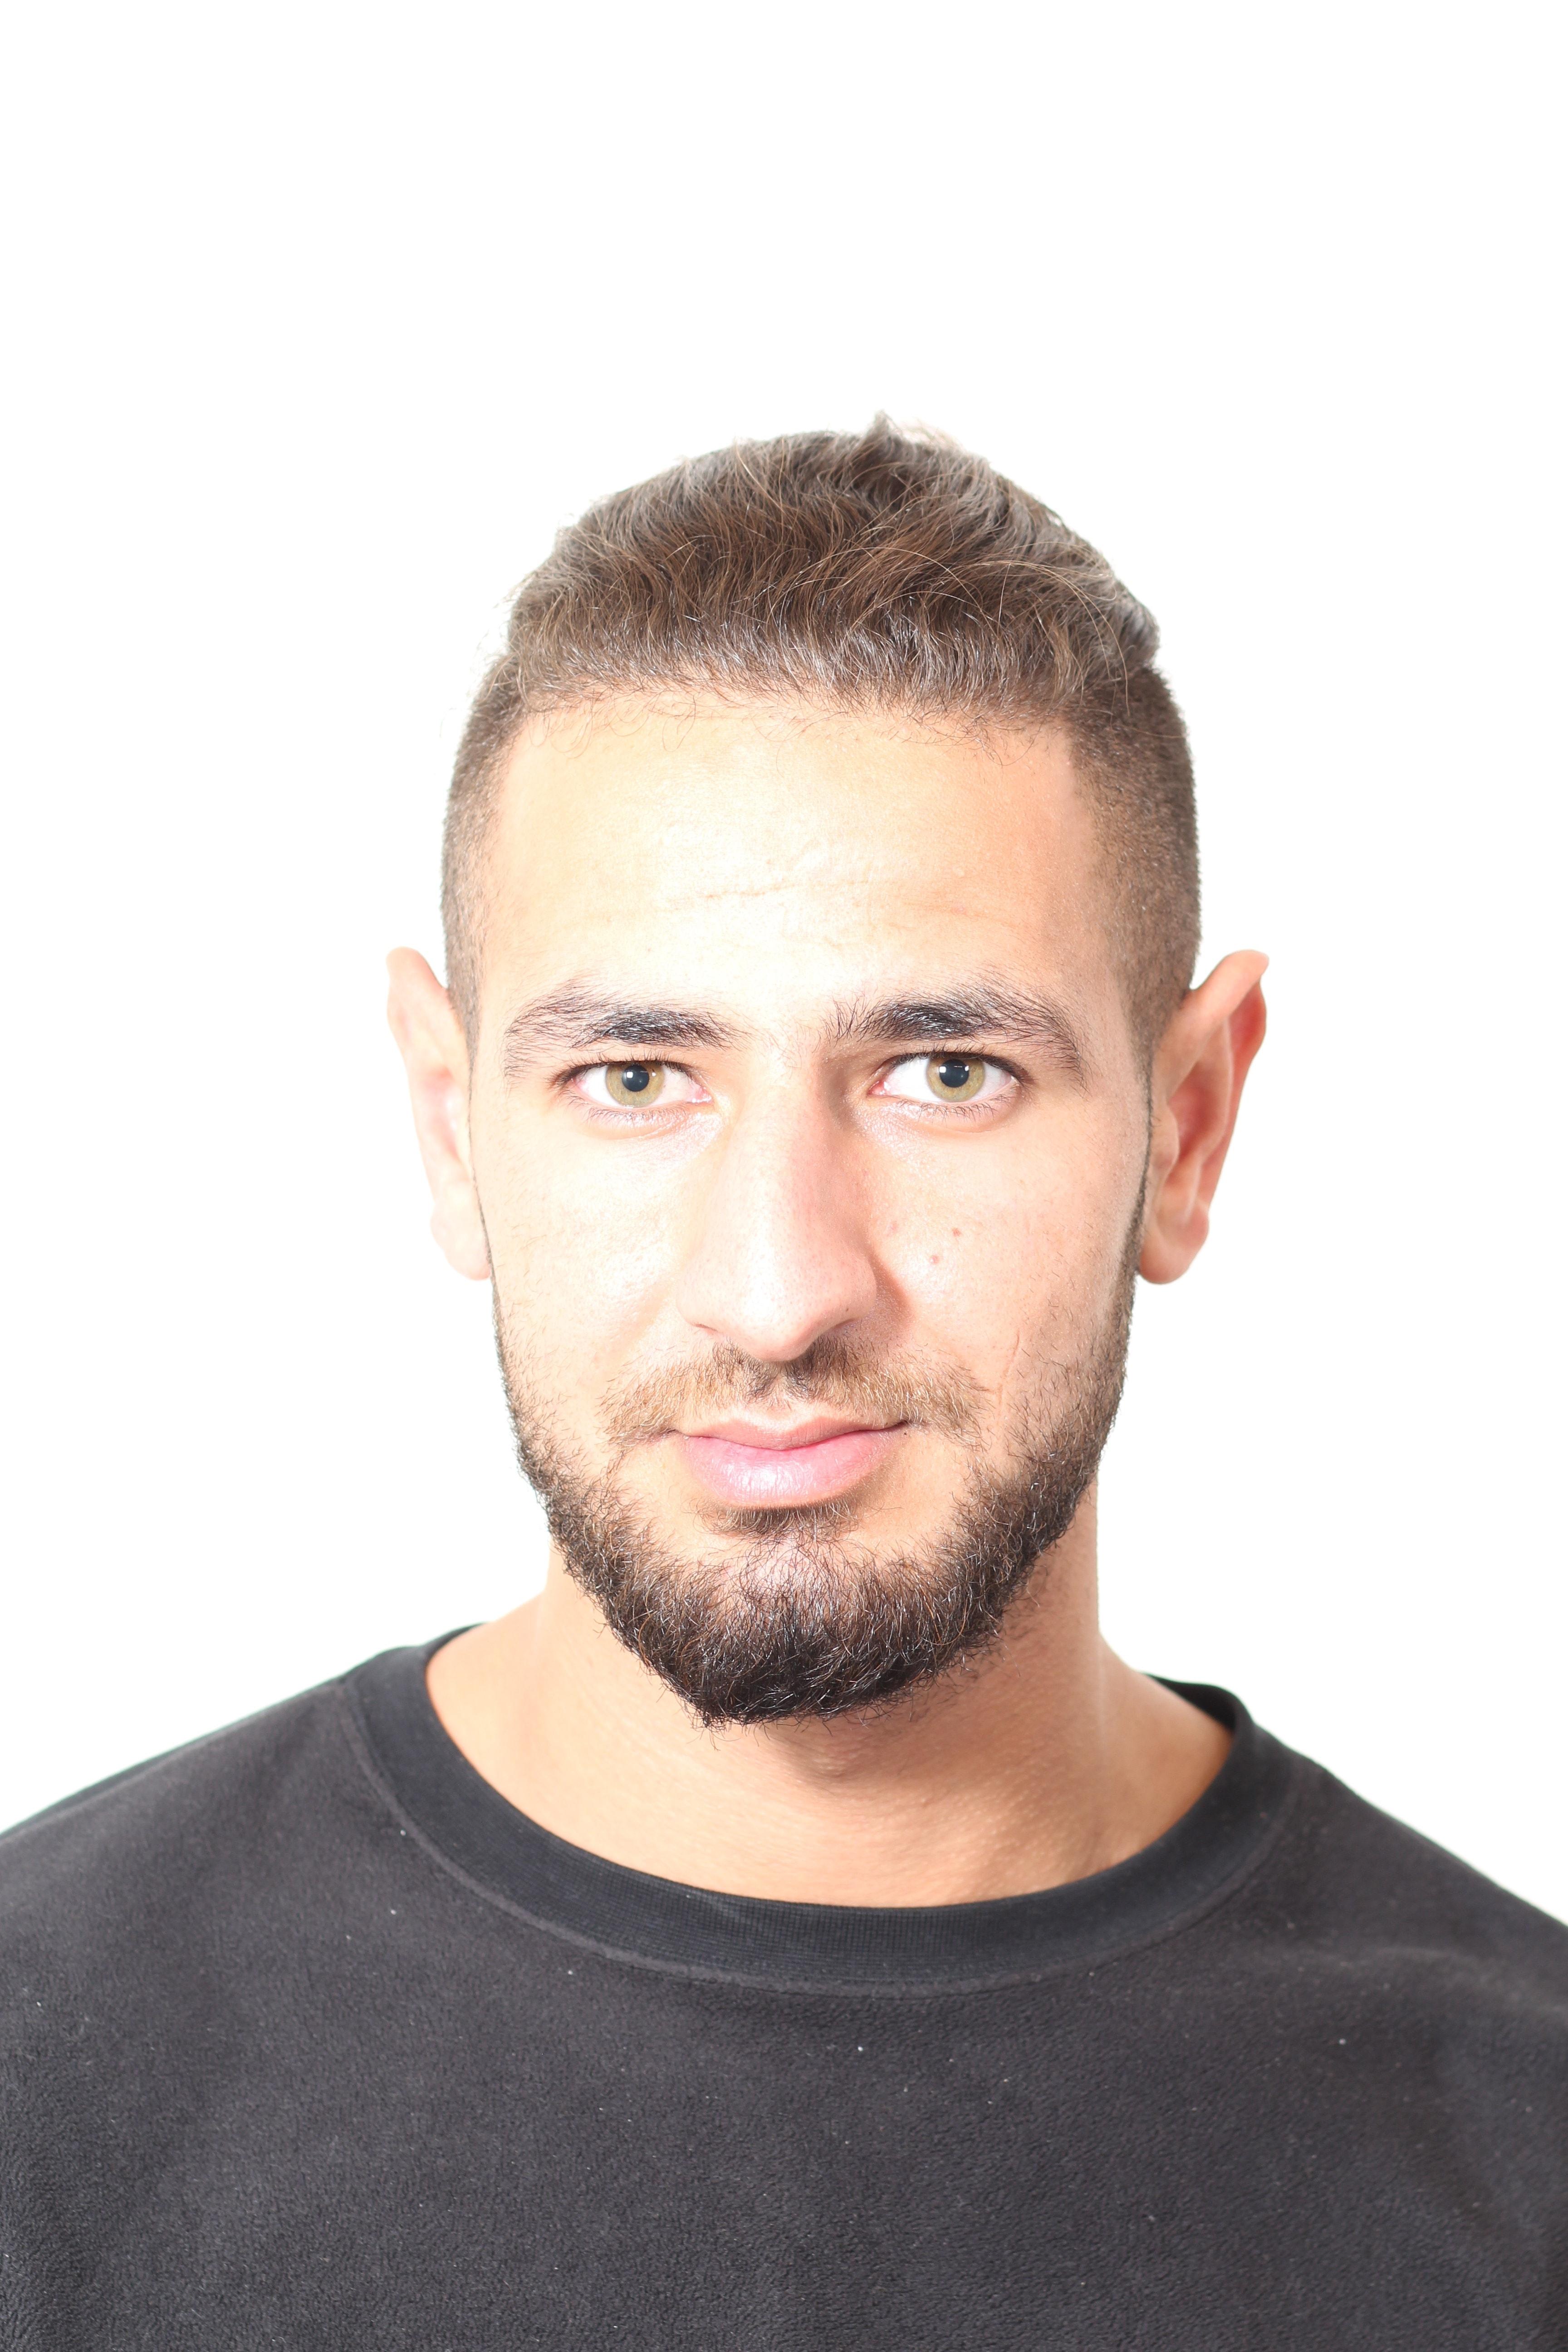 Abdallah Ahmad Taha